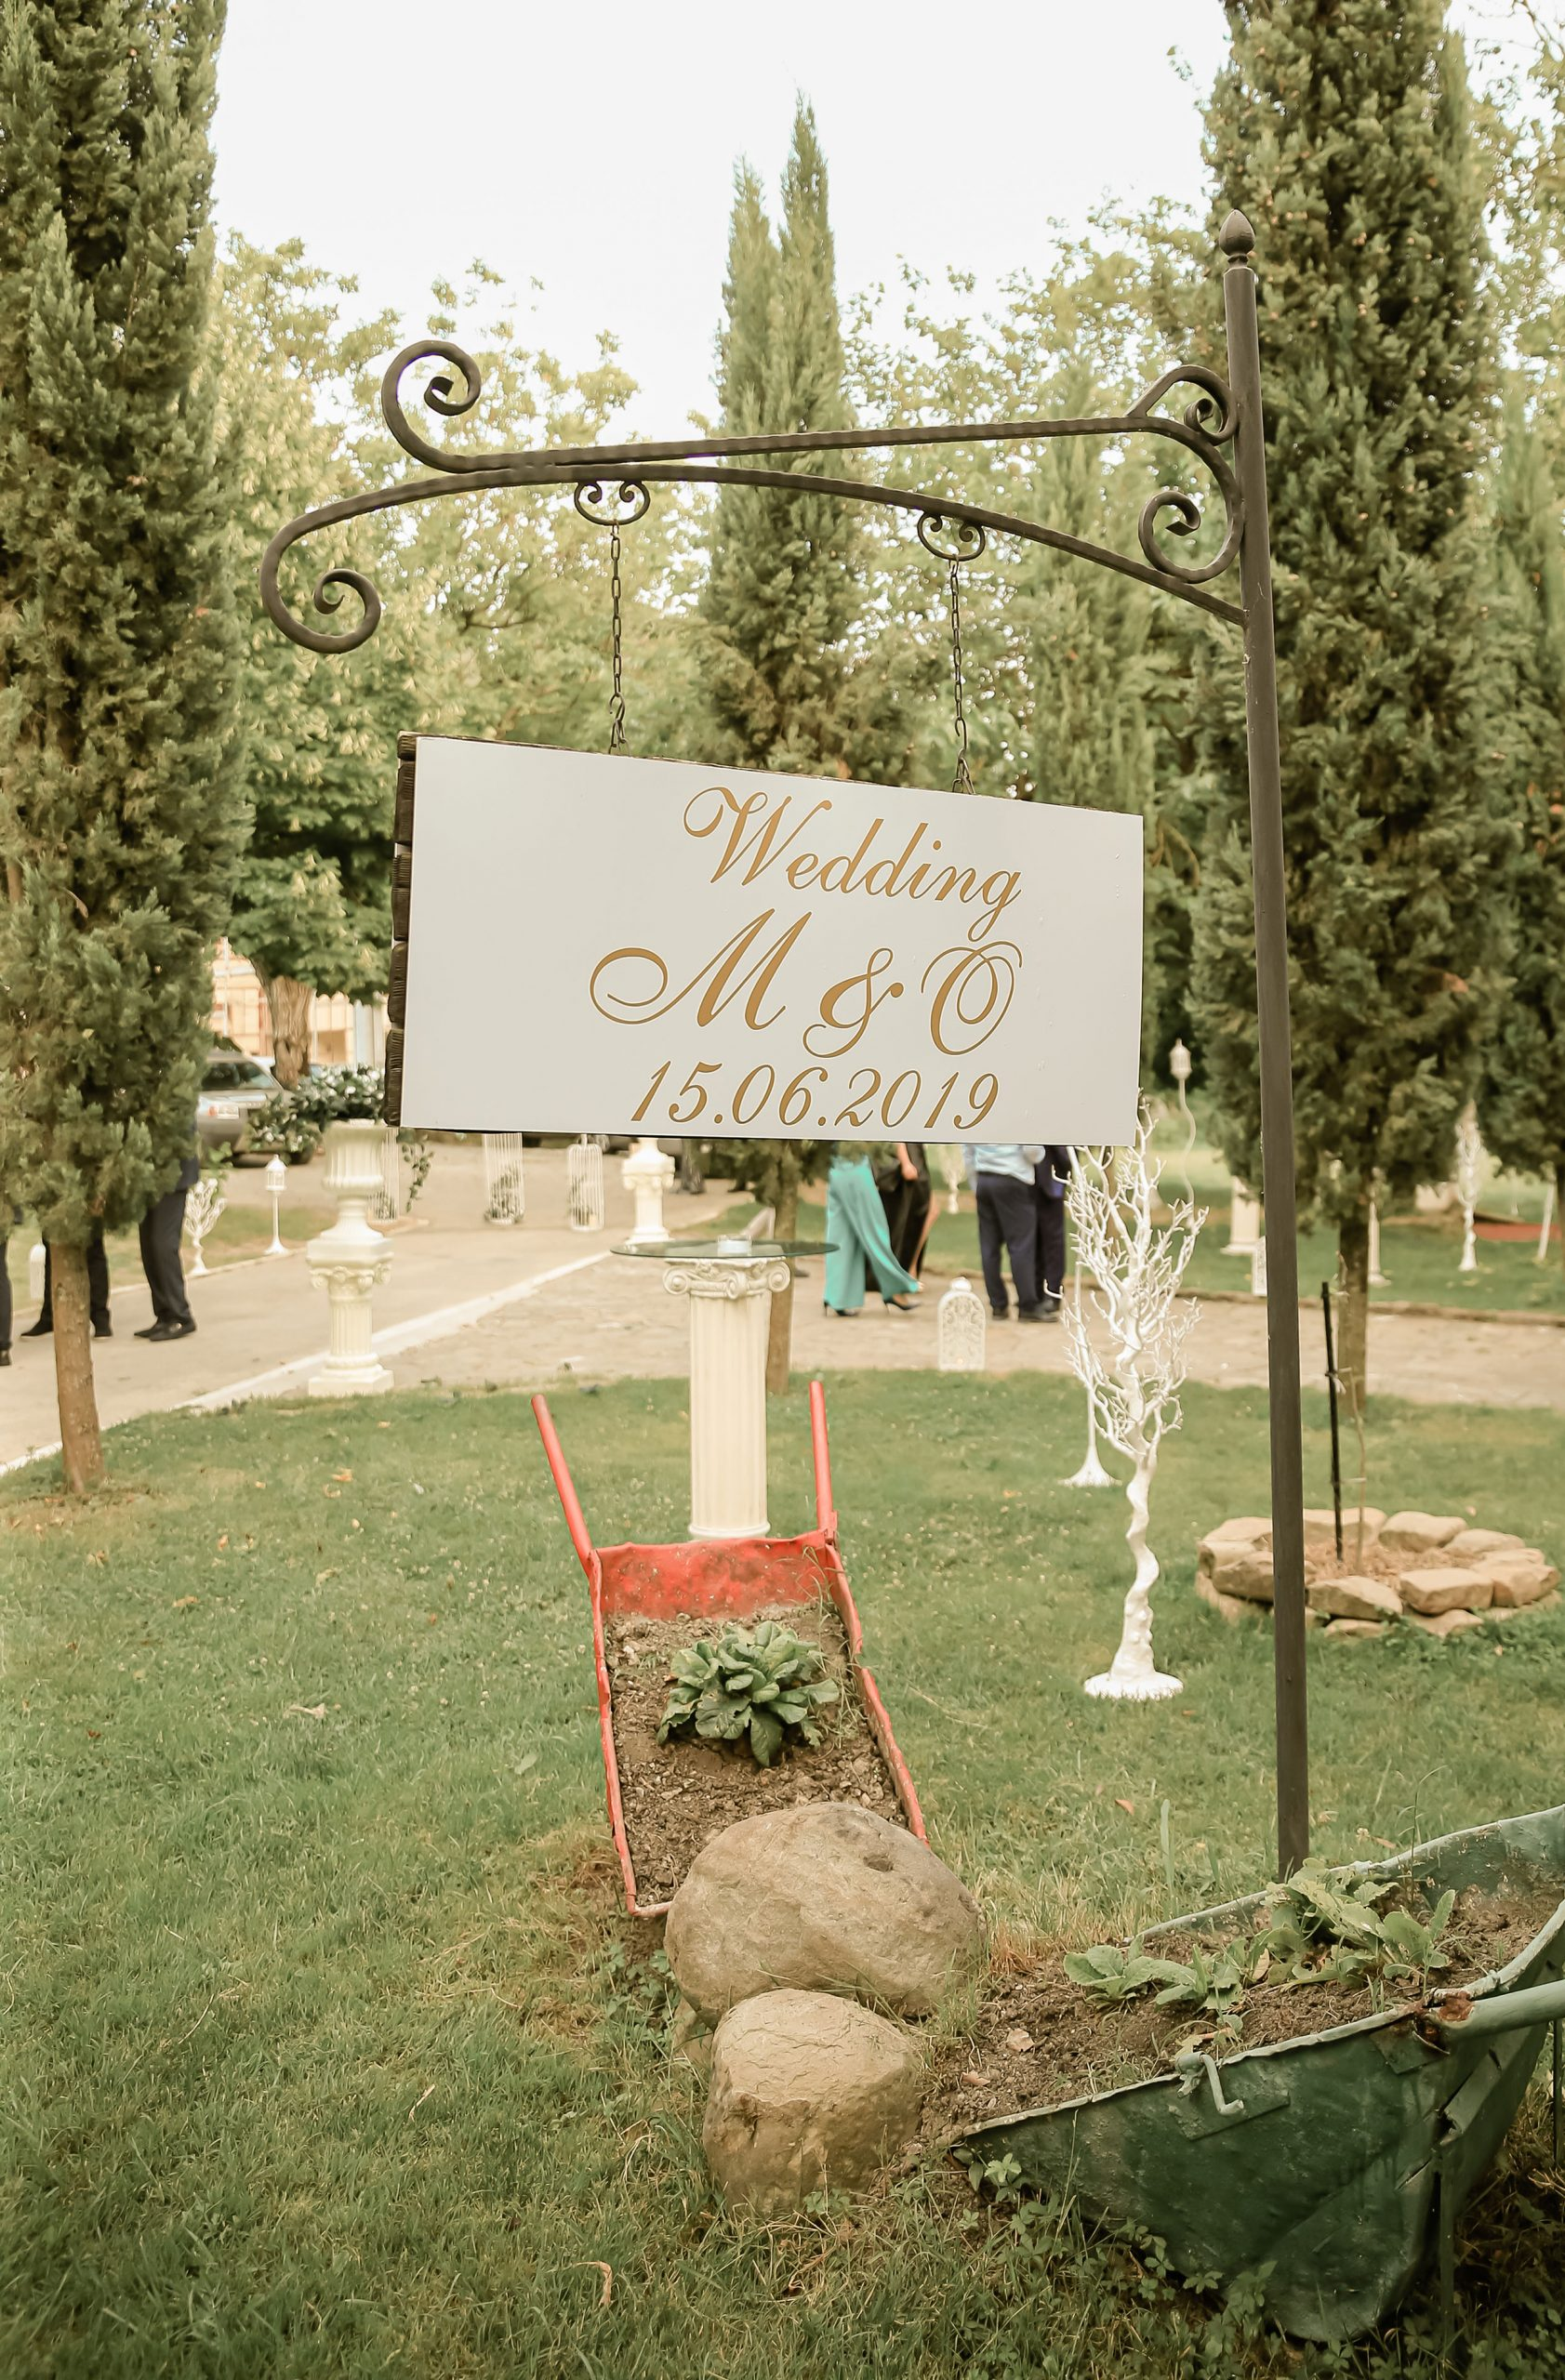 Outdoor wedding welcome sign